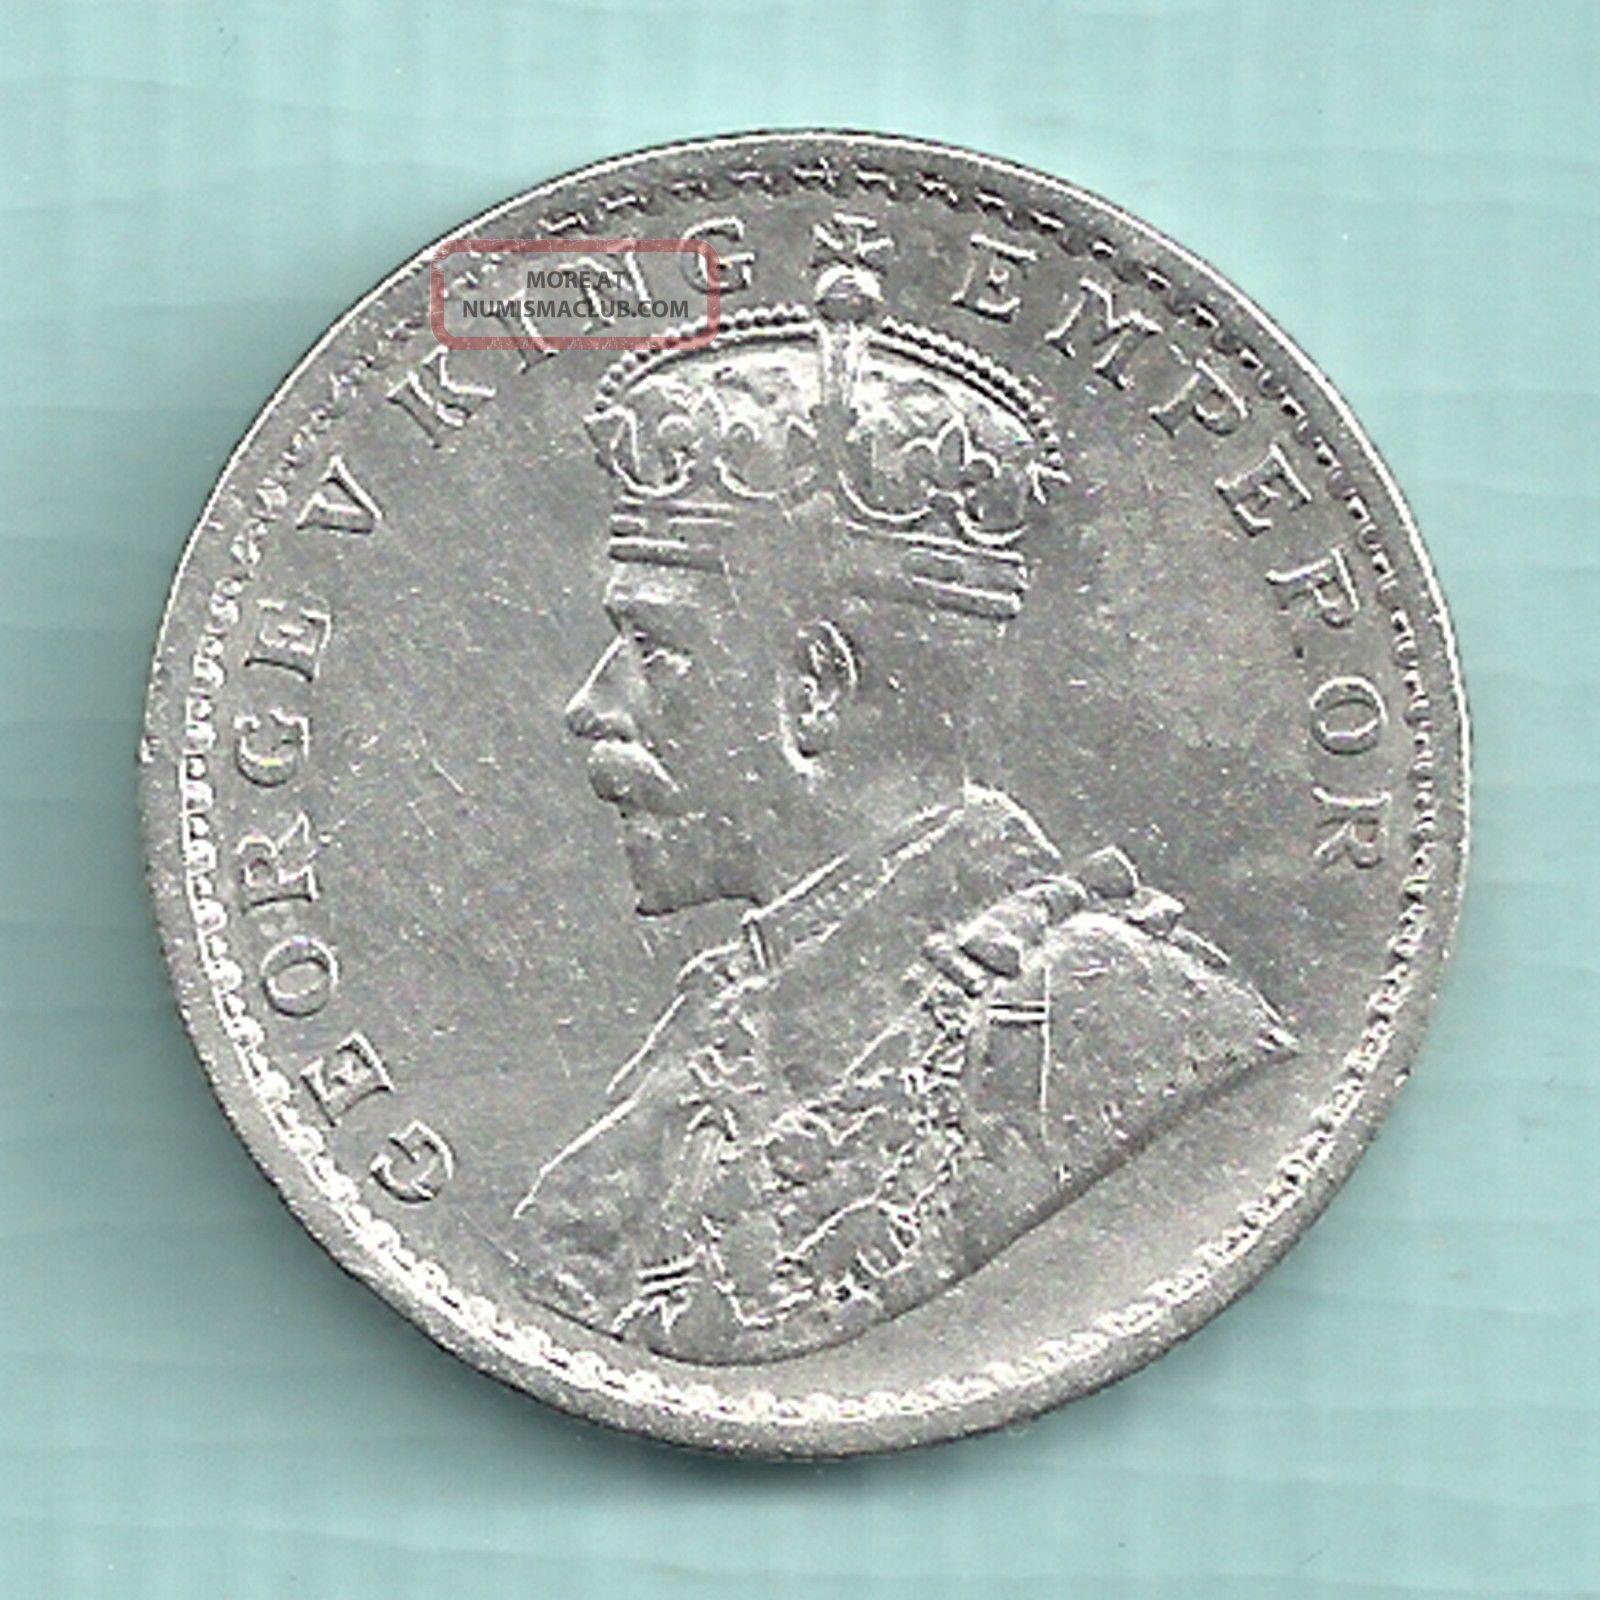 British India 1914 King George V Emperor One Rupee